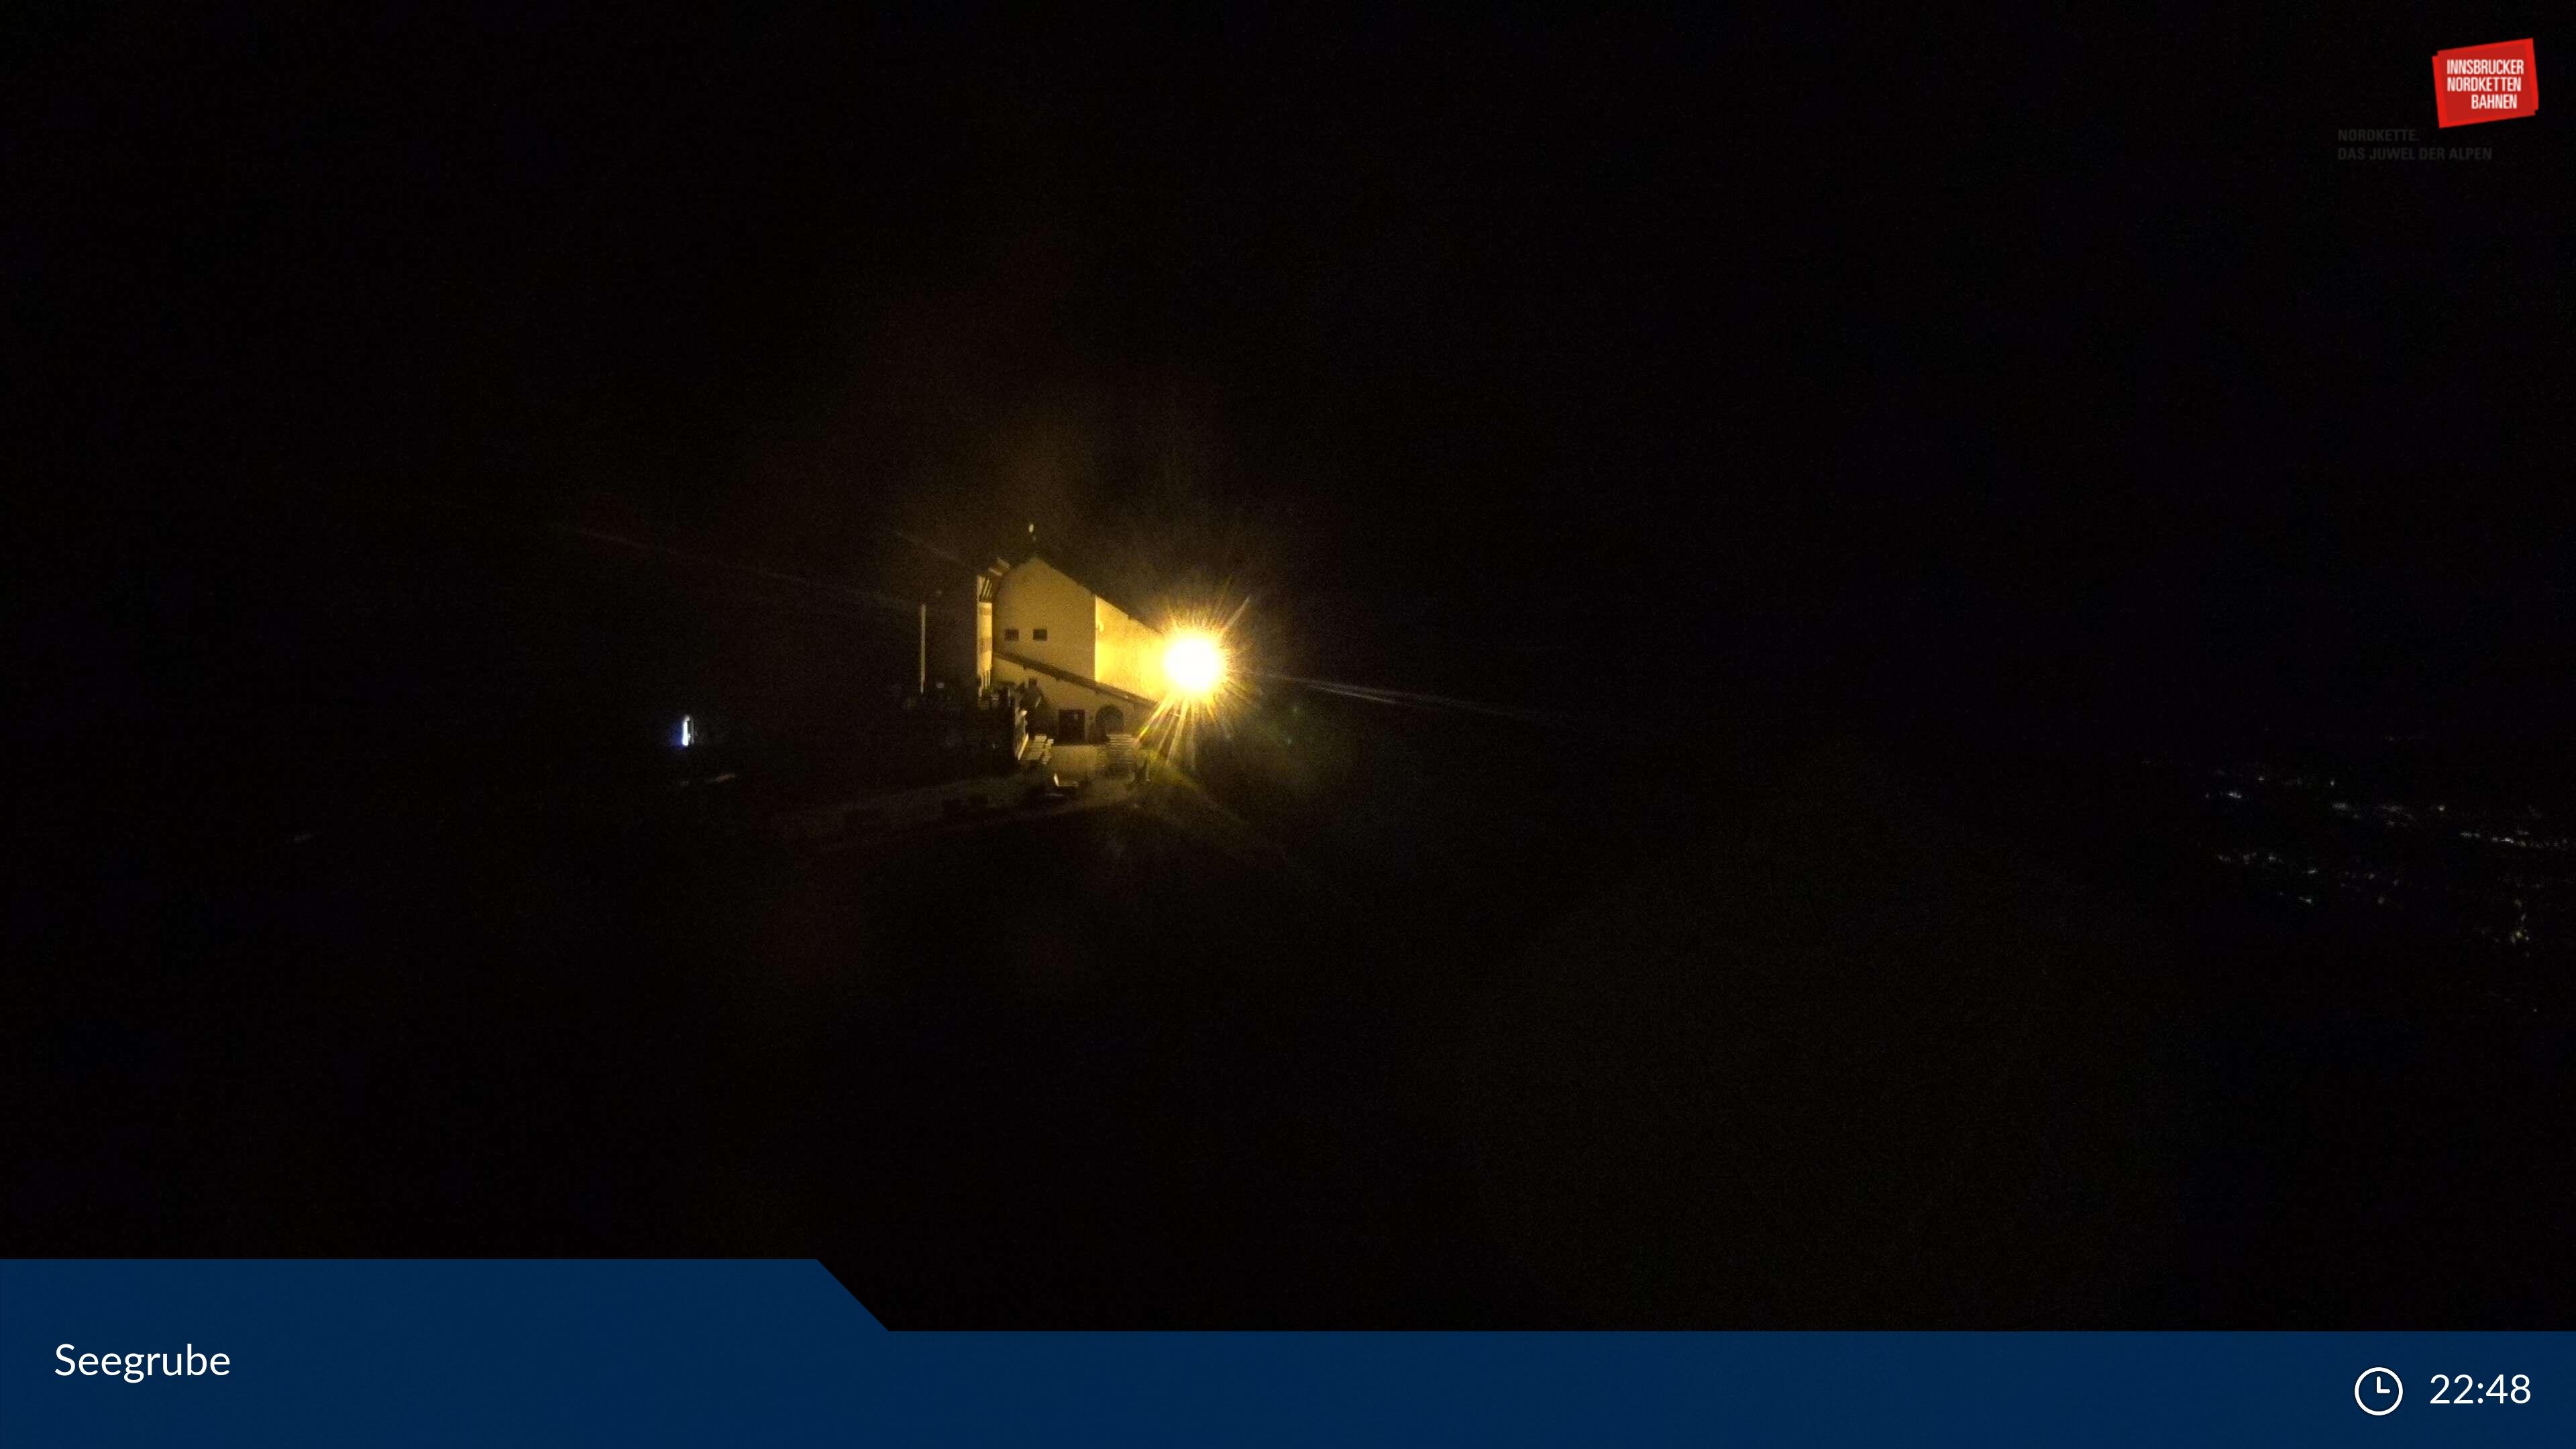 Innsbruck - Seegrube